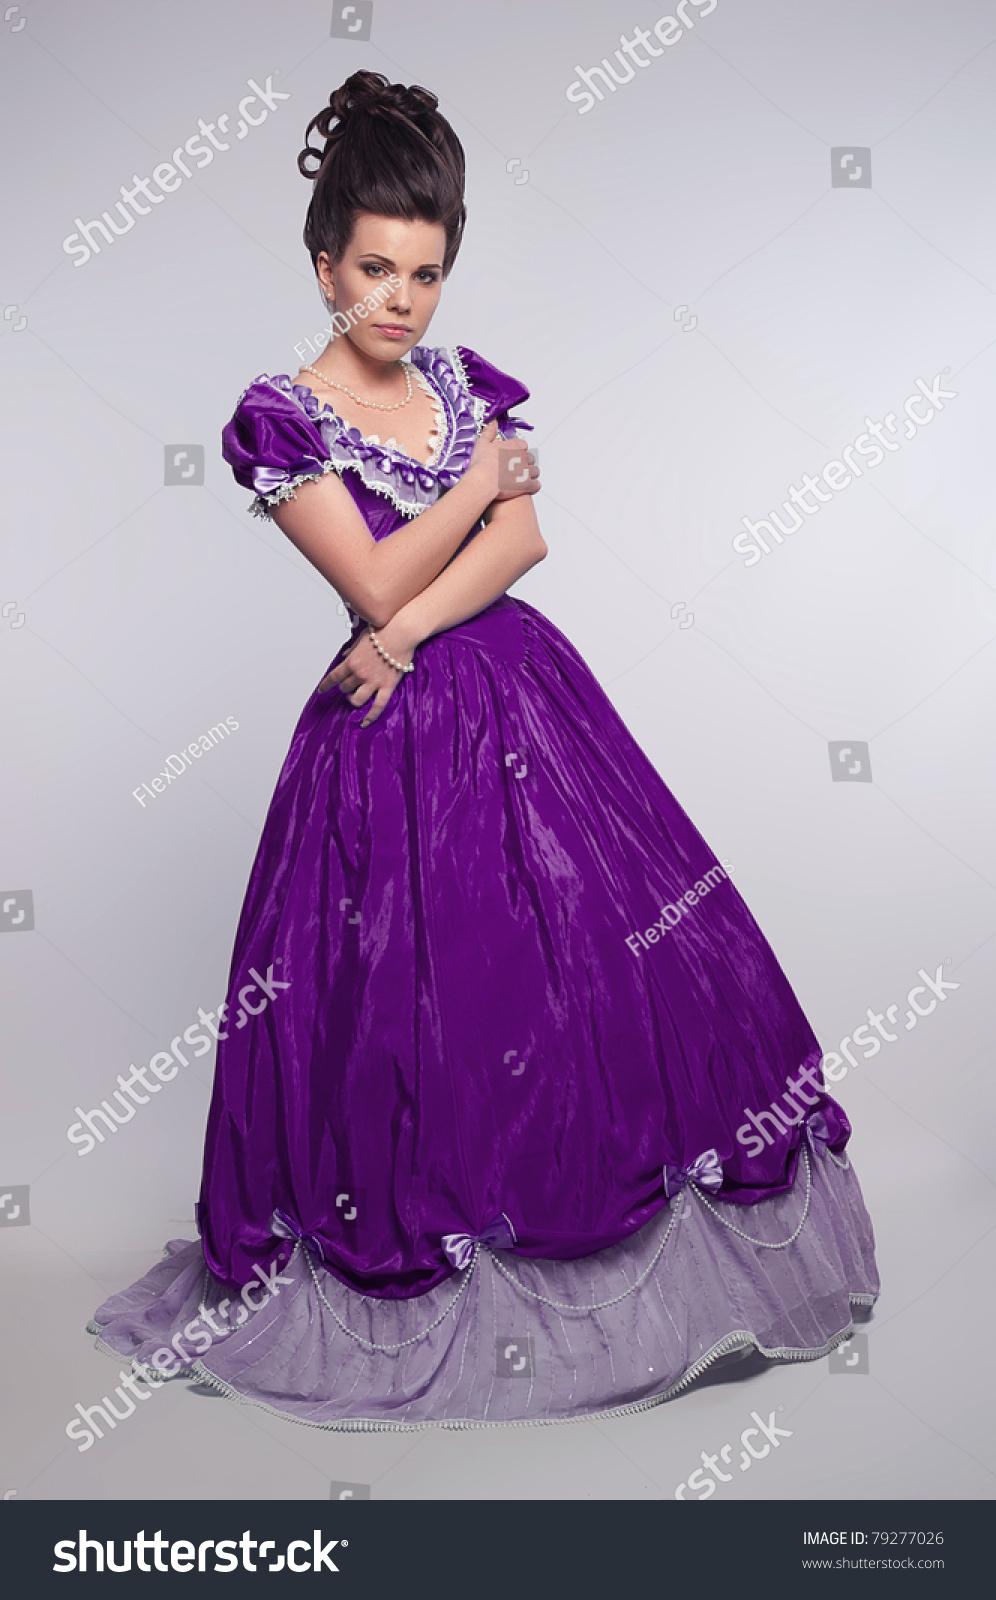 Old Fashioned Girl In Cyan Dress Stock Photo 79277026 : Shutterstock